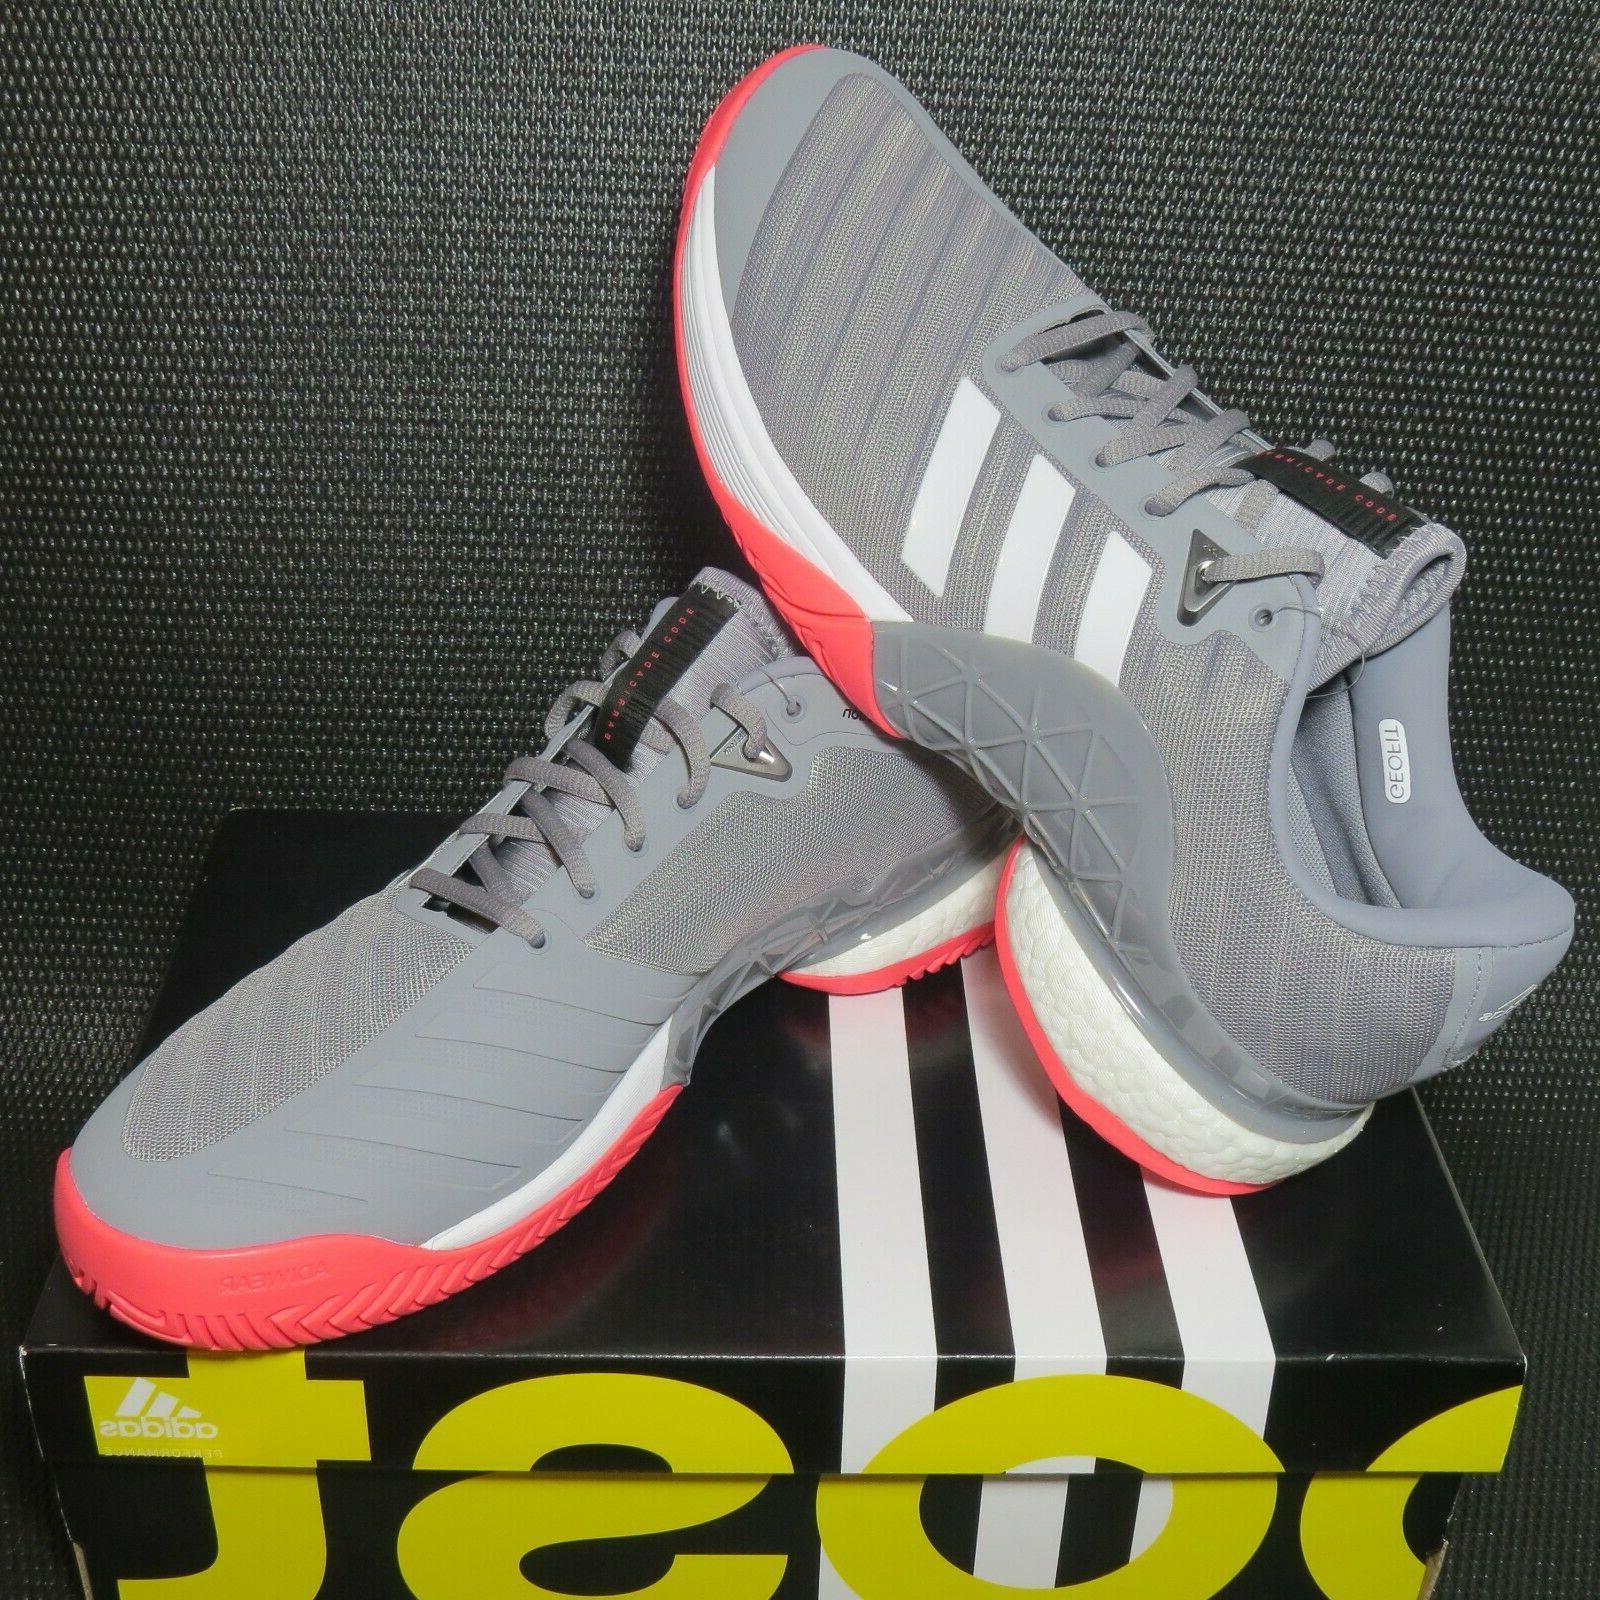 adidas Barricade AH2094 Tennis Grey/White/Pink